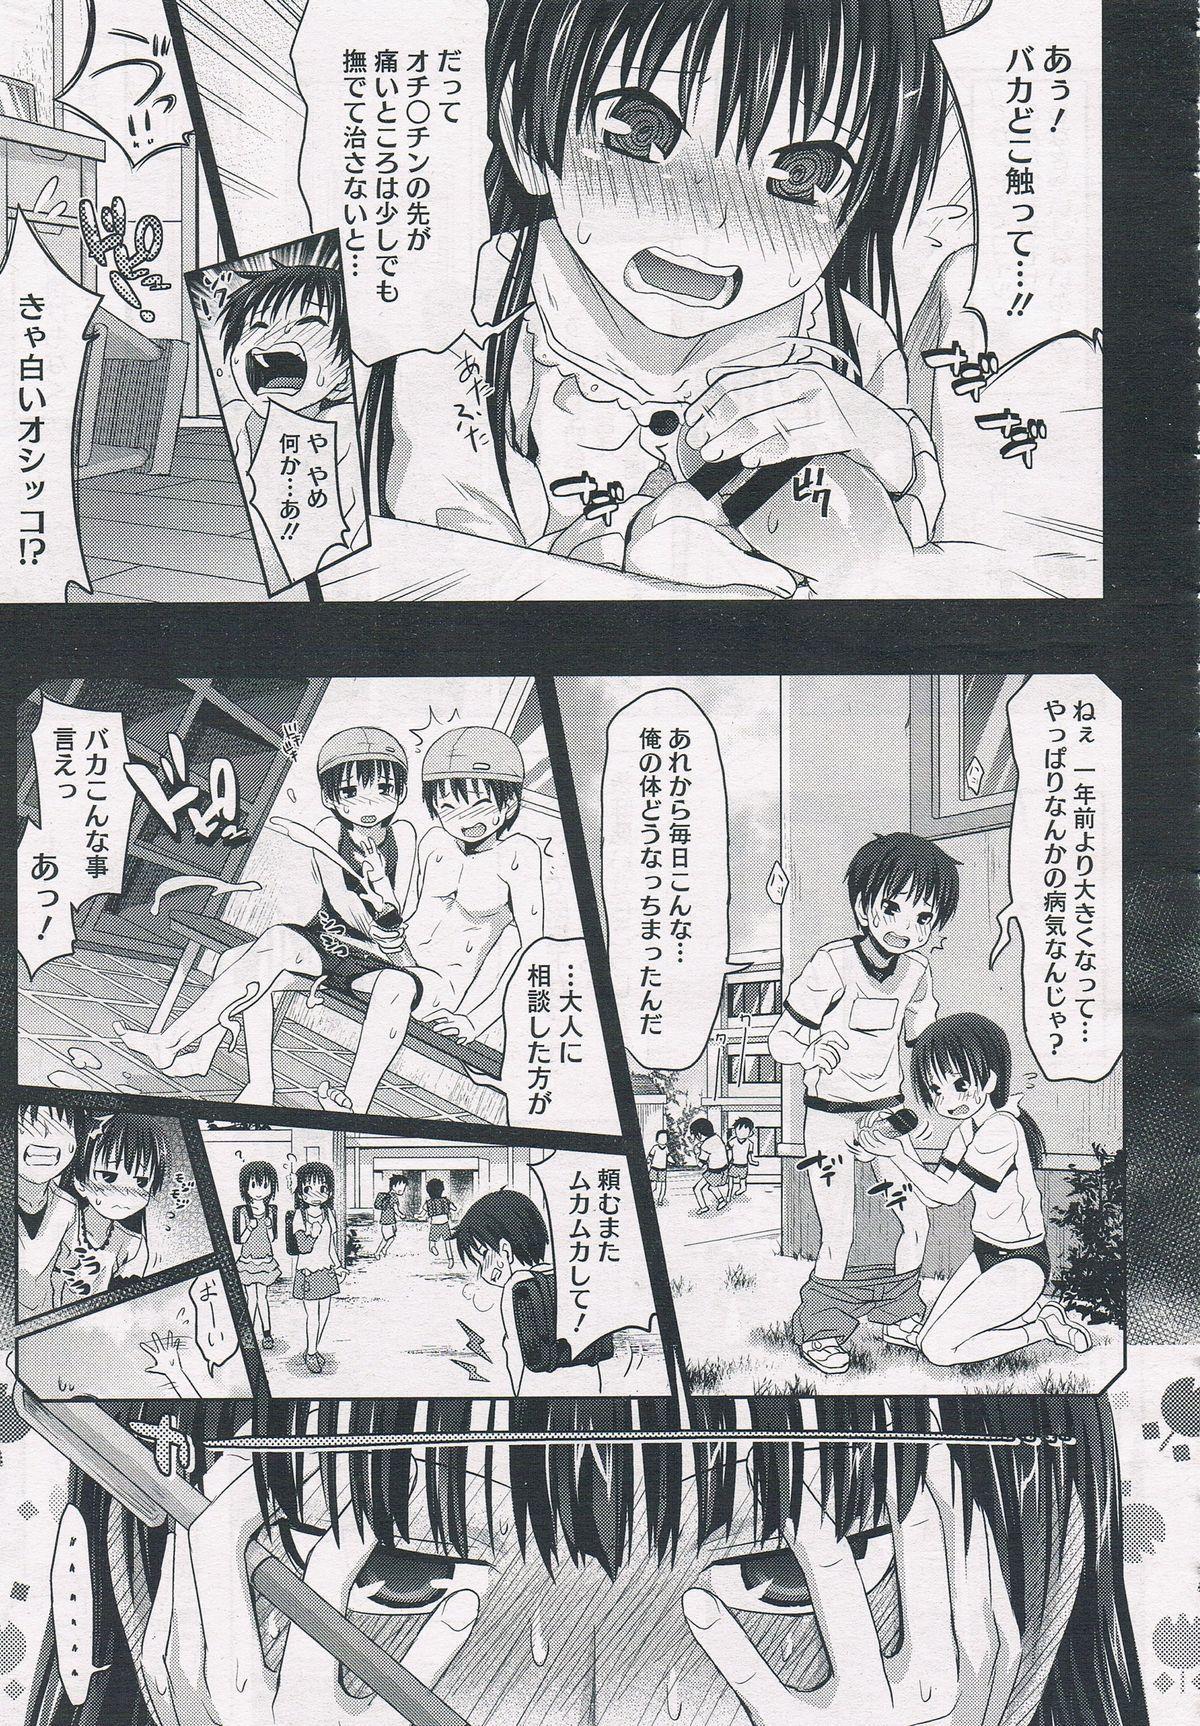 Migite no koibito COMIC Megastore 2012-07 4